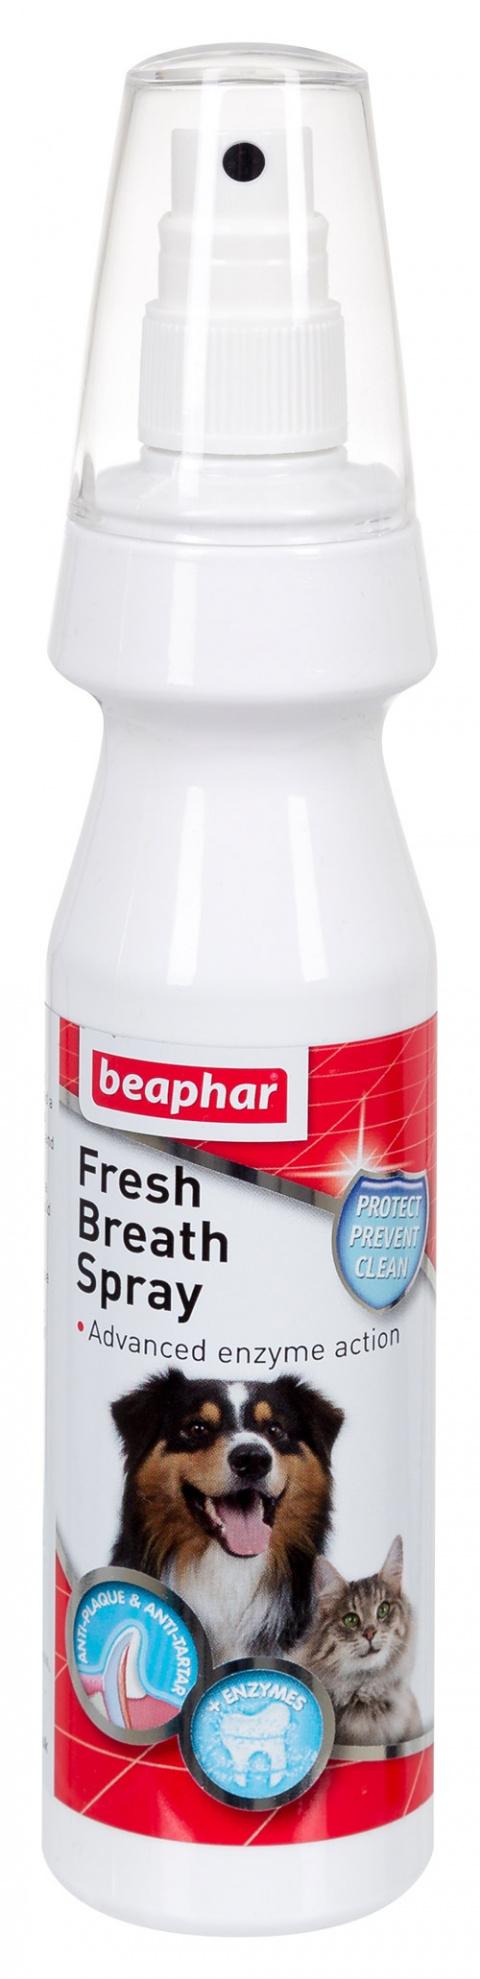 Sprej pro svěží dech Beaphar Fresh Breath 150 ml title=